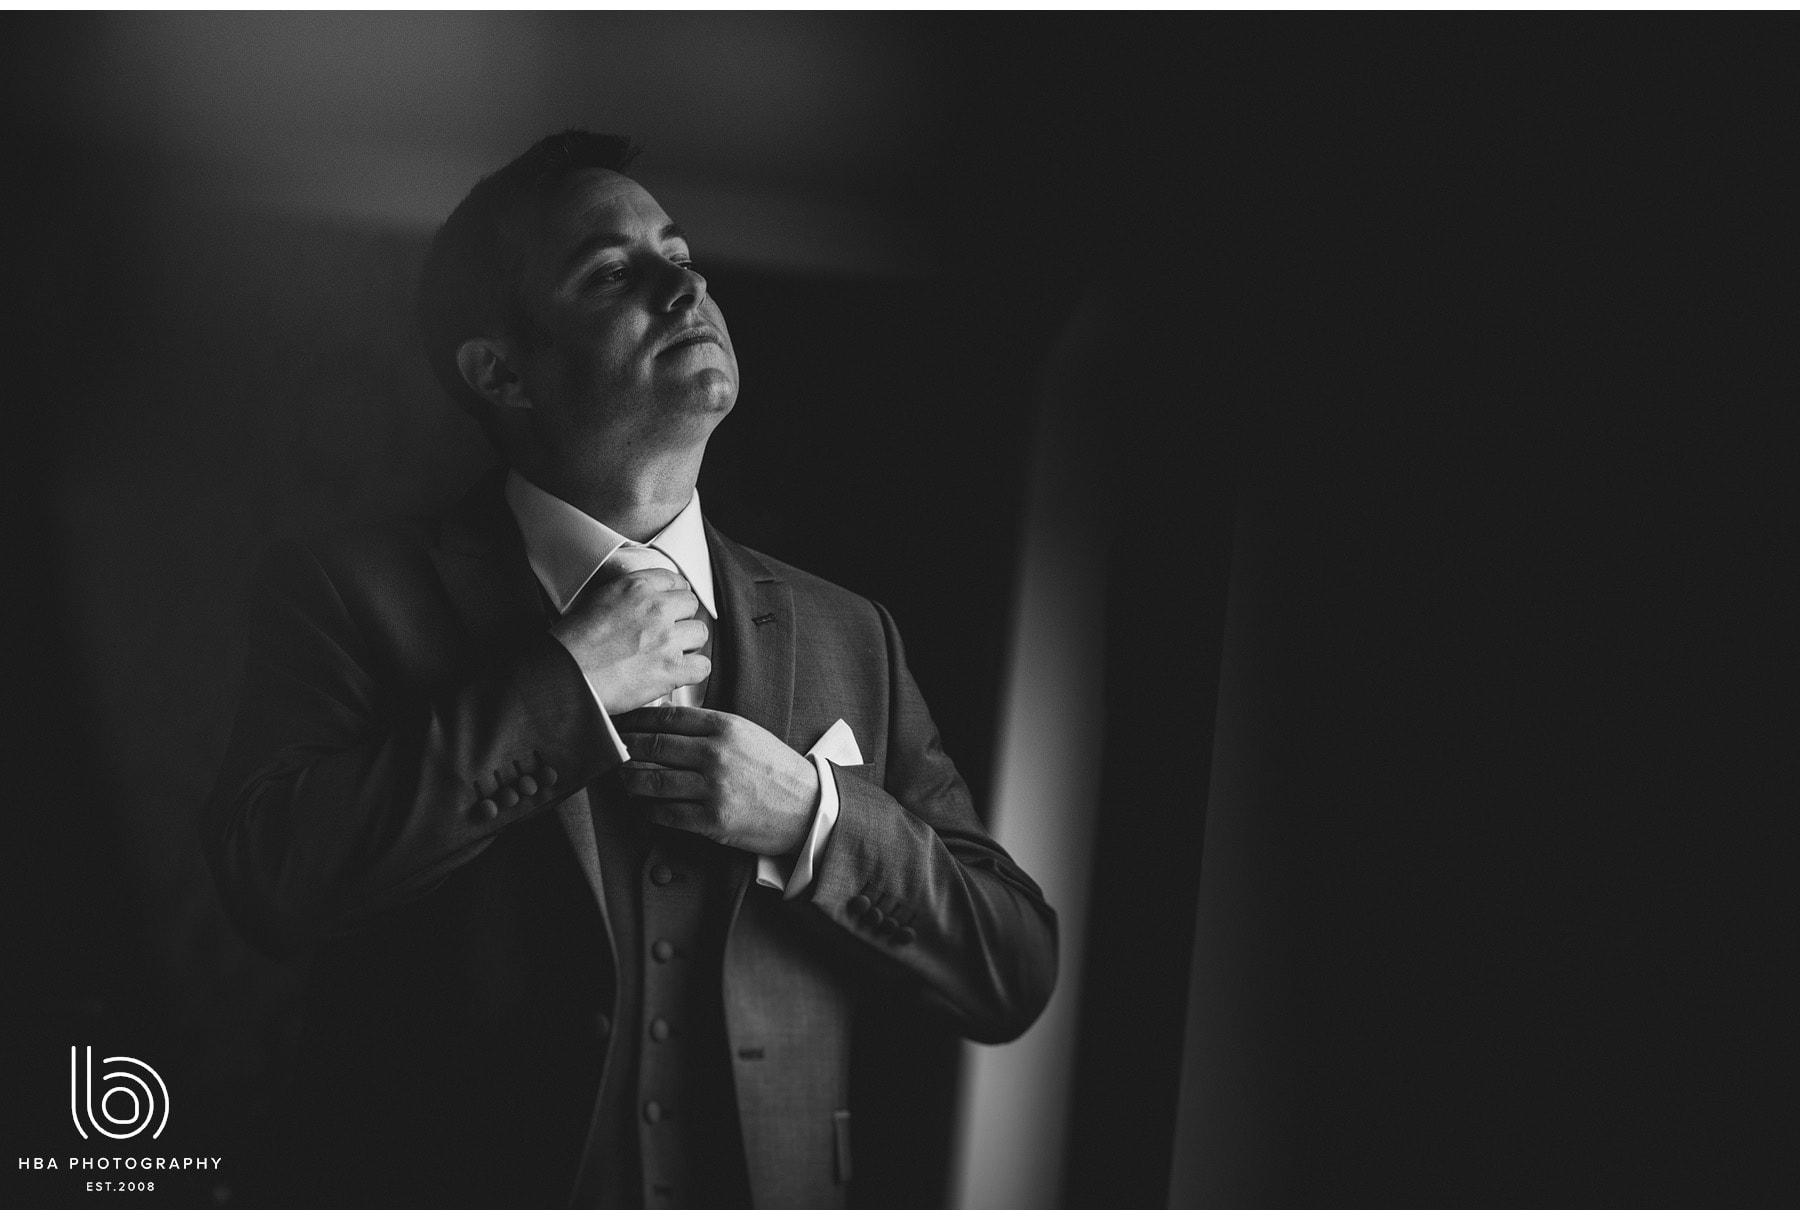 the groom doing his tie